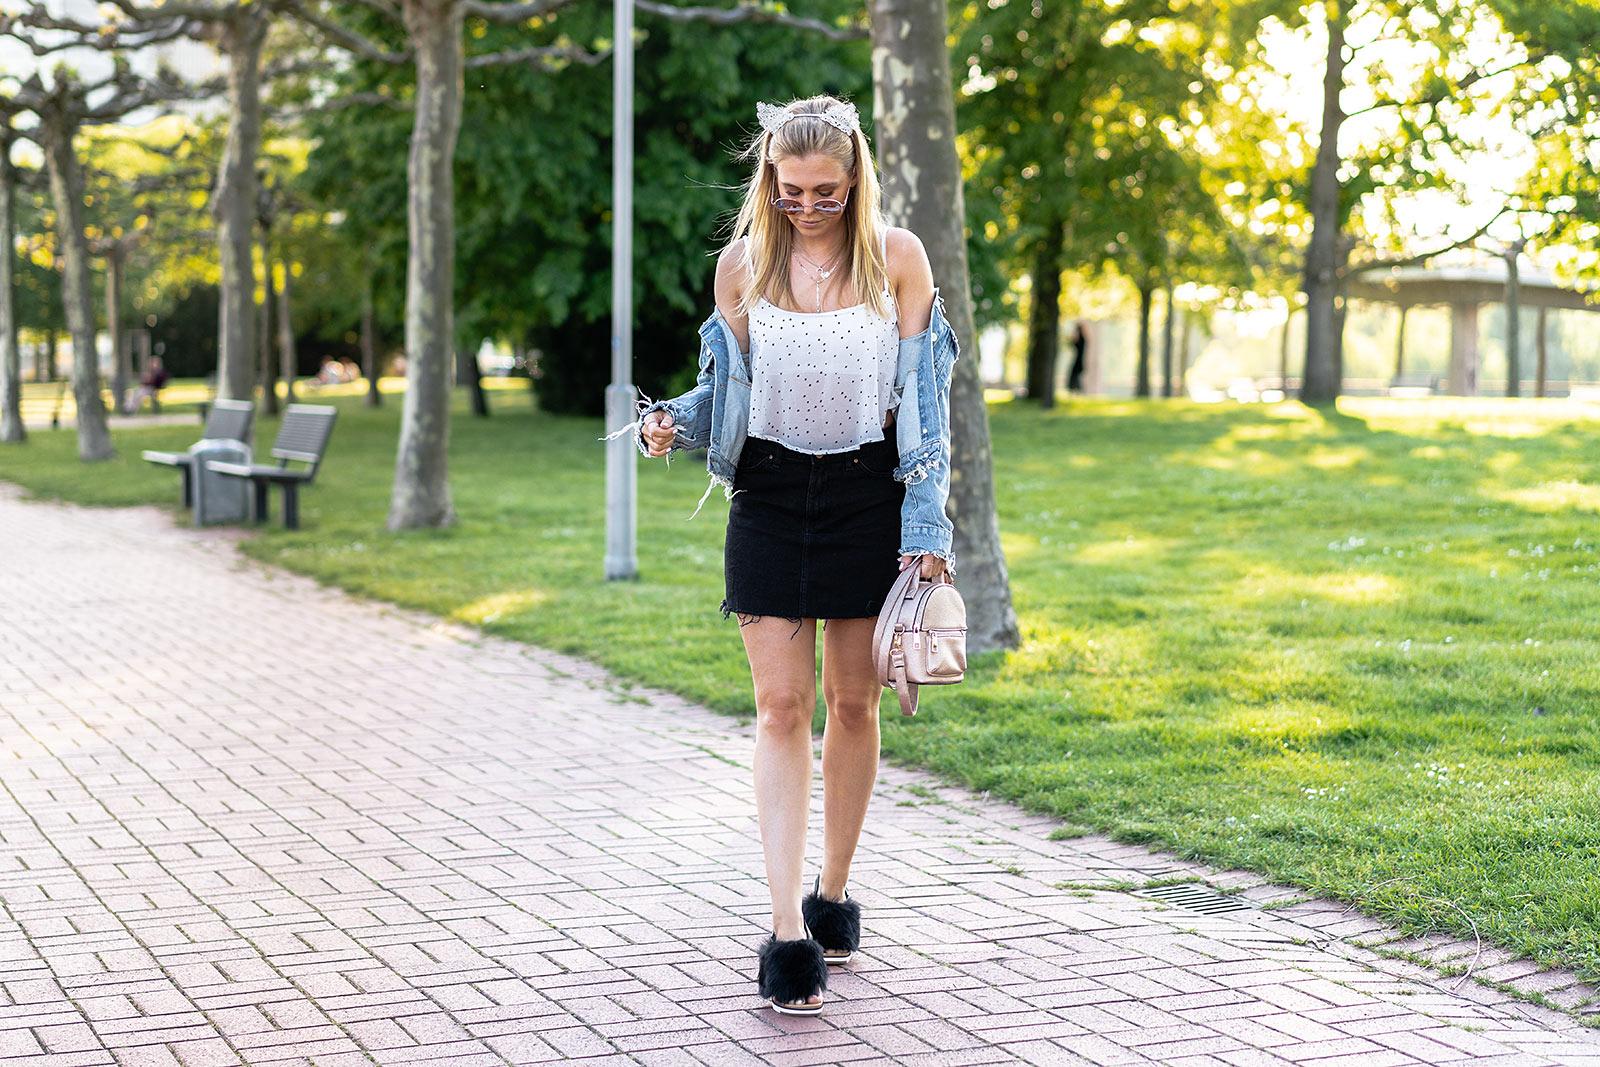 ugg sandalen festival outfit fashion blogger sunnyinga düsseldorf